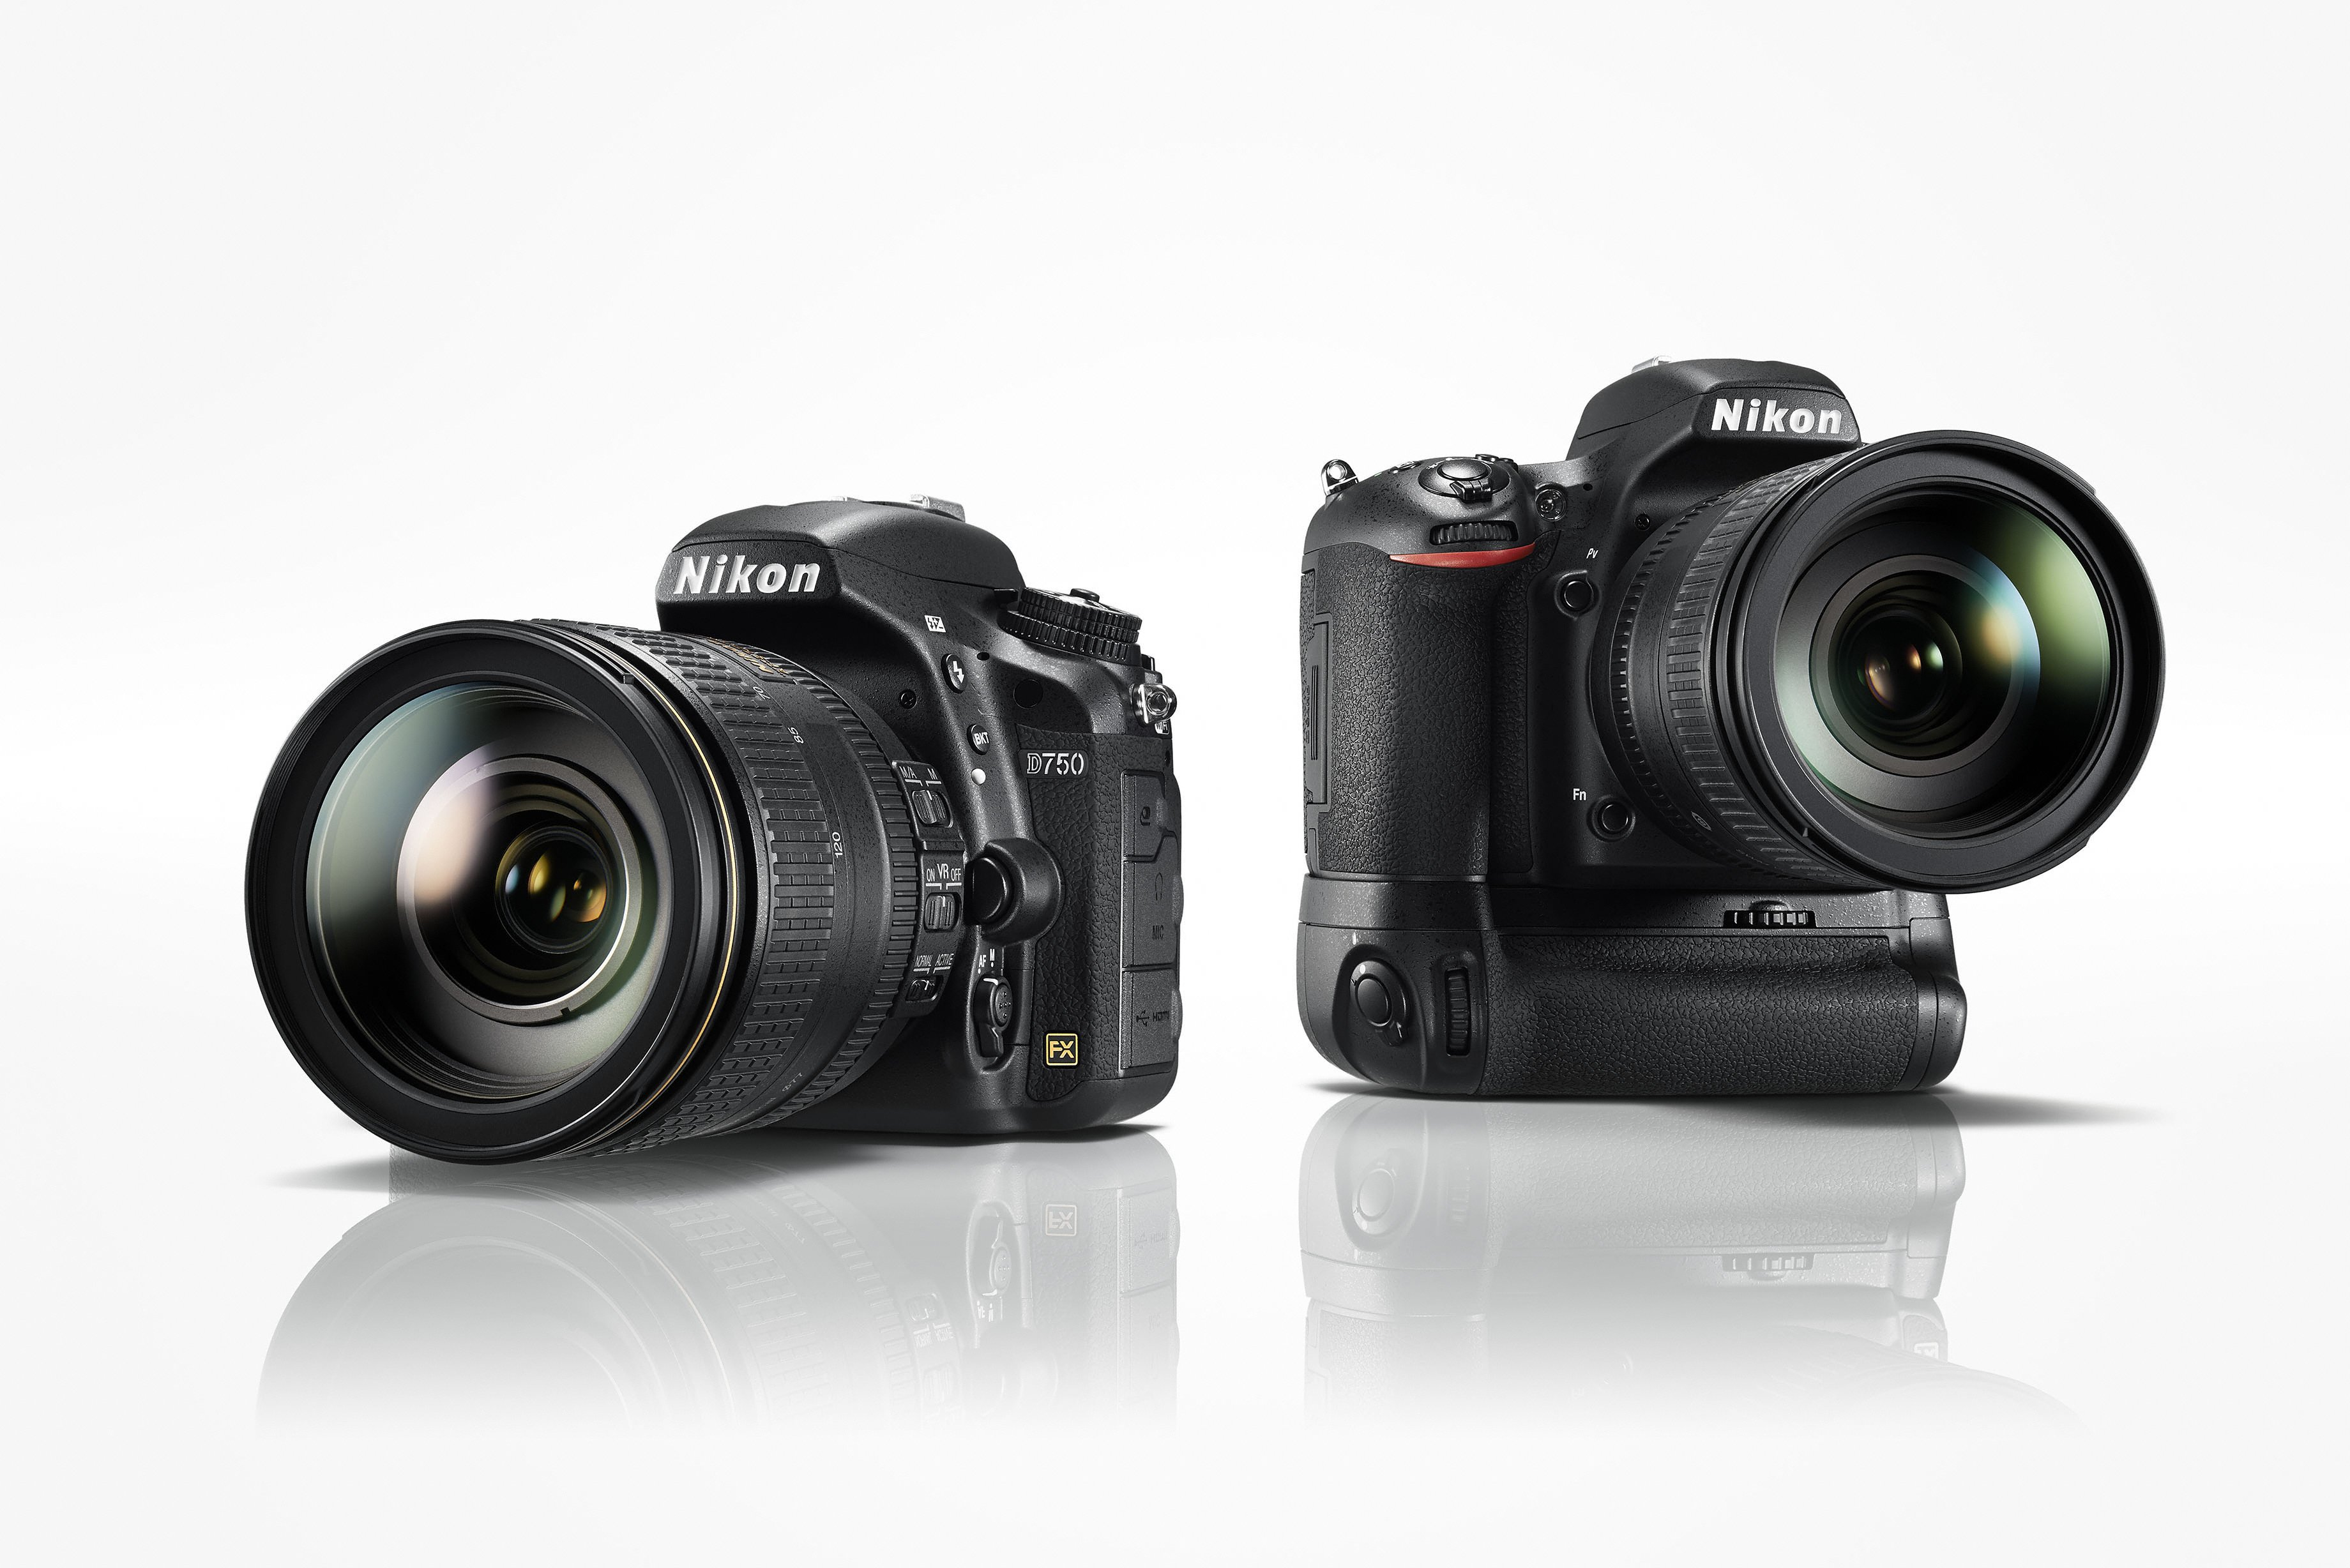 Nikon Releases New Firmware Version C-1 02 For Nikon D750